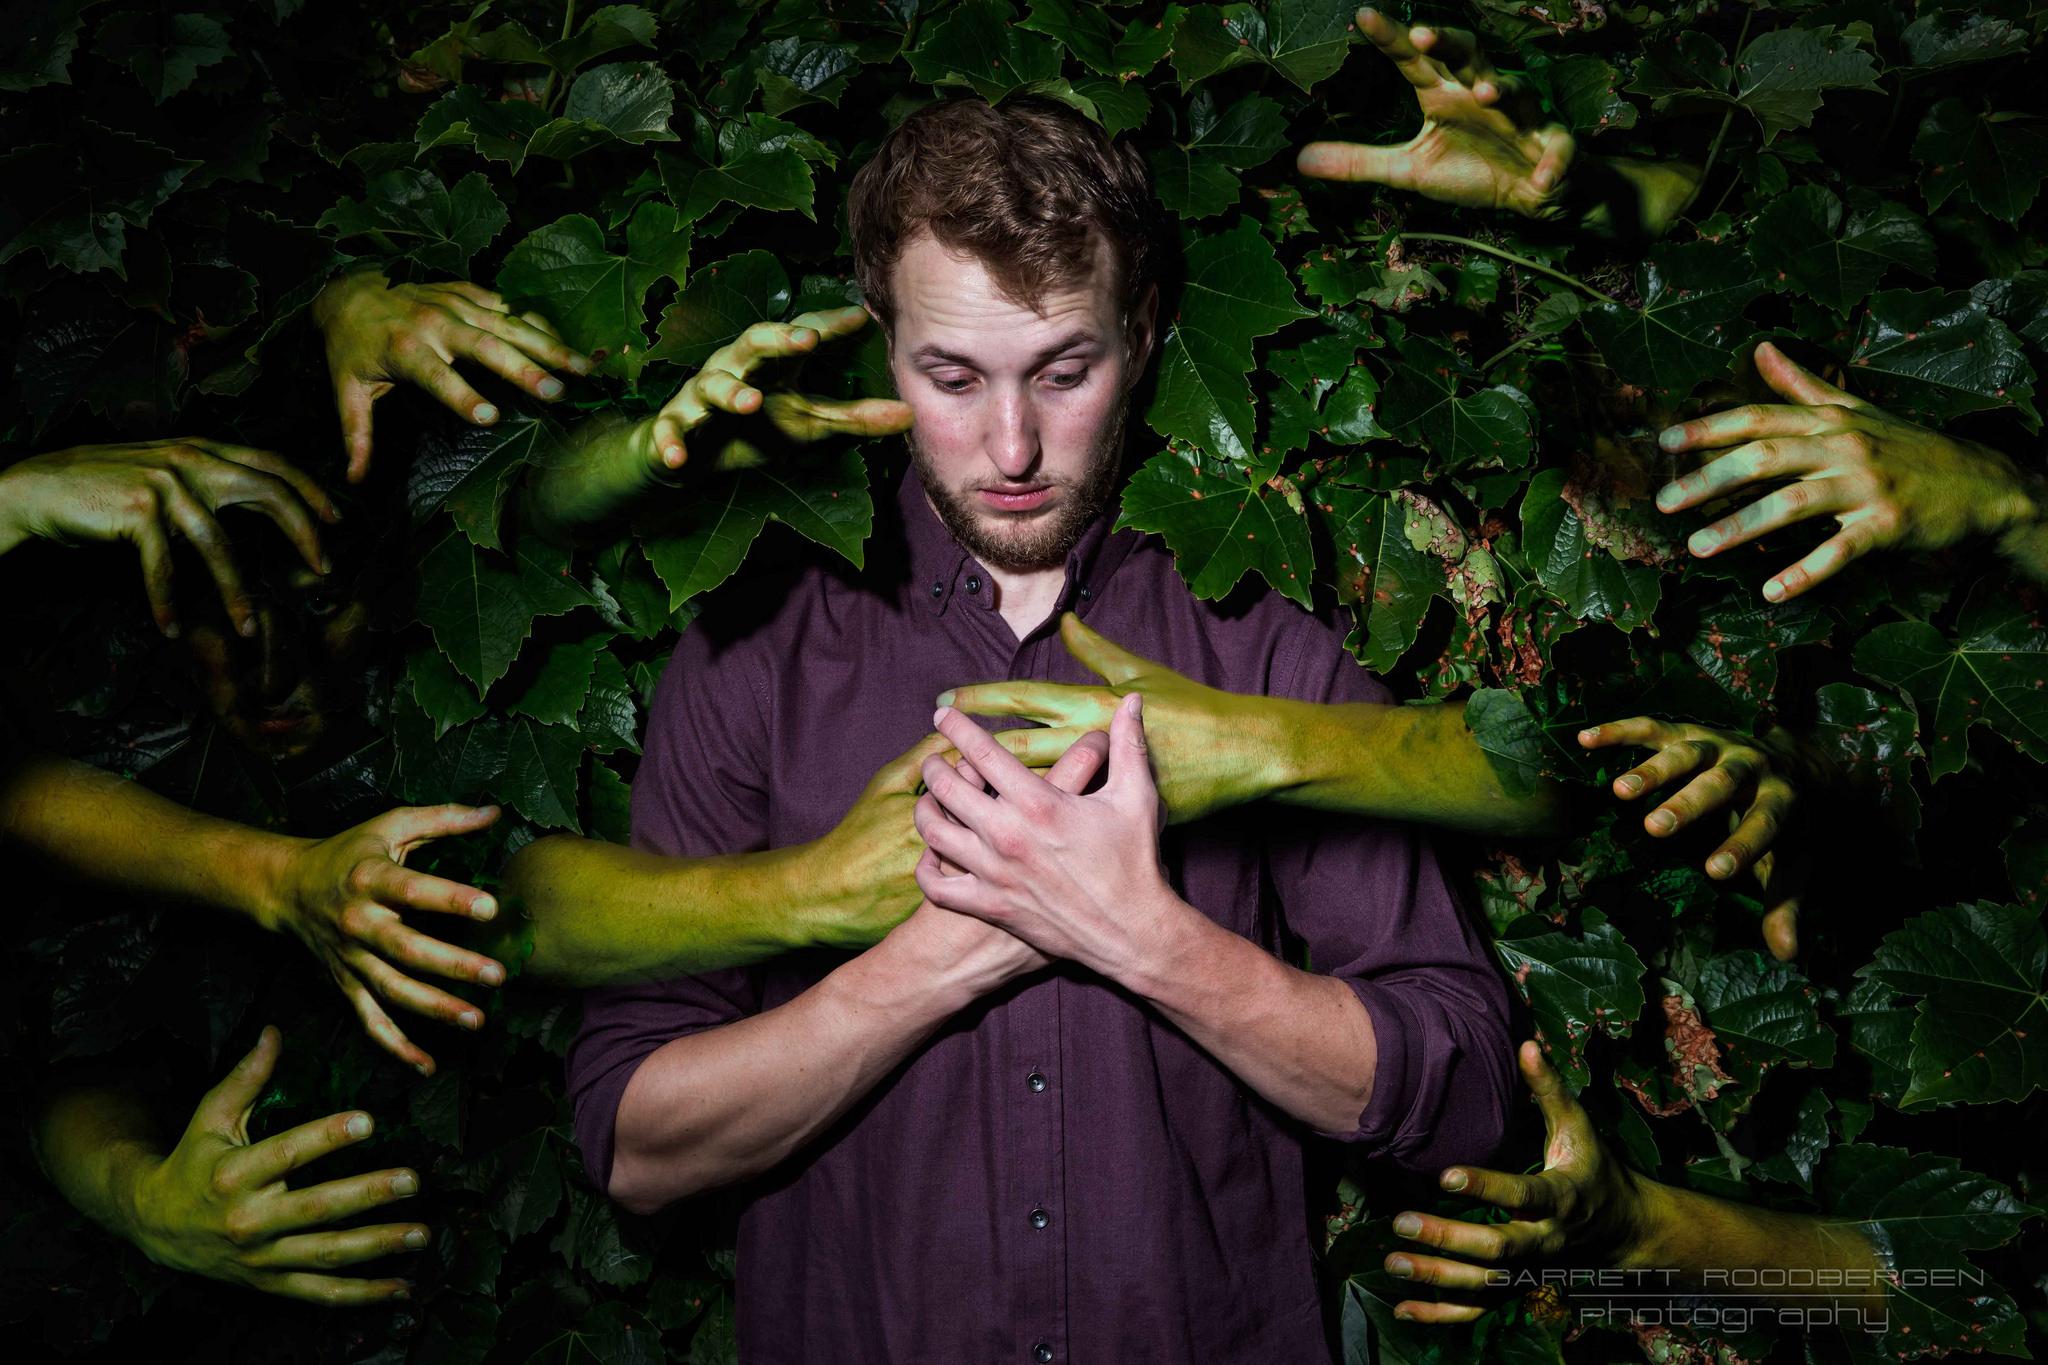 Grabbed by Nature #nature #zombie #letgo